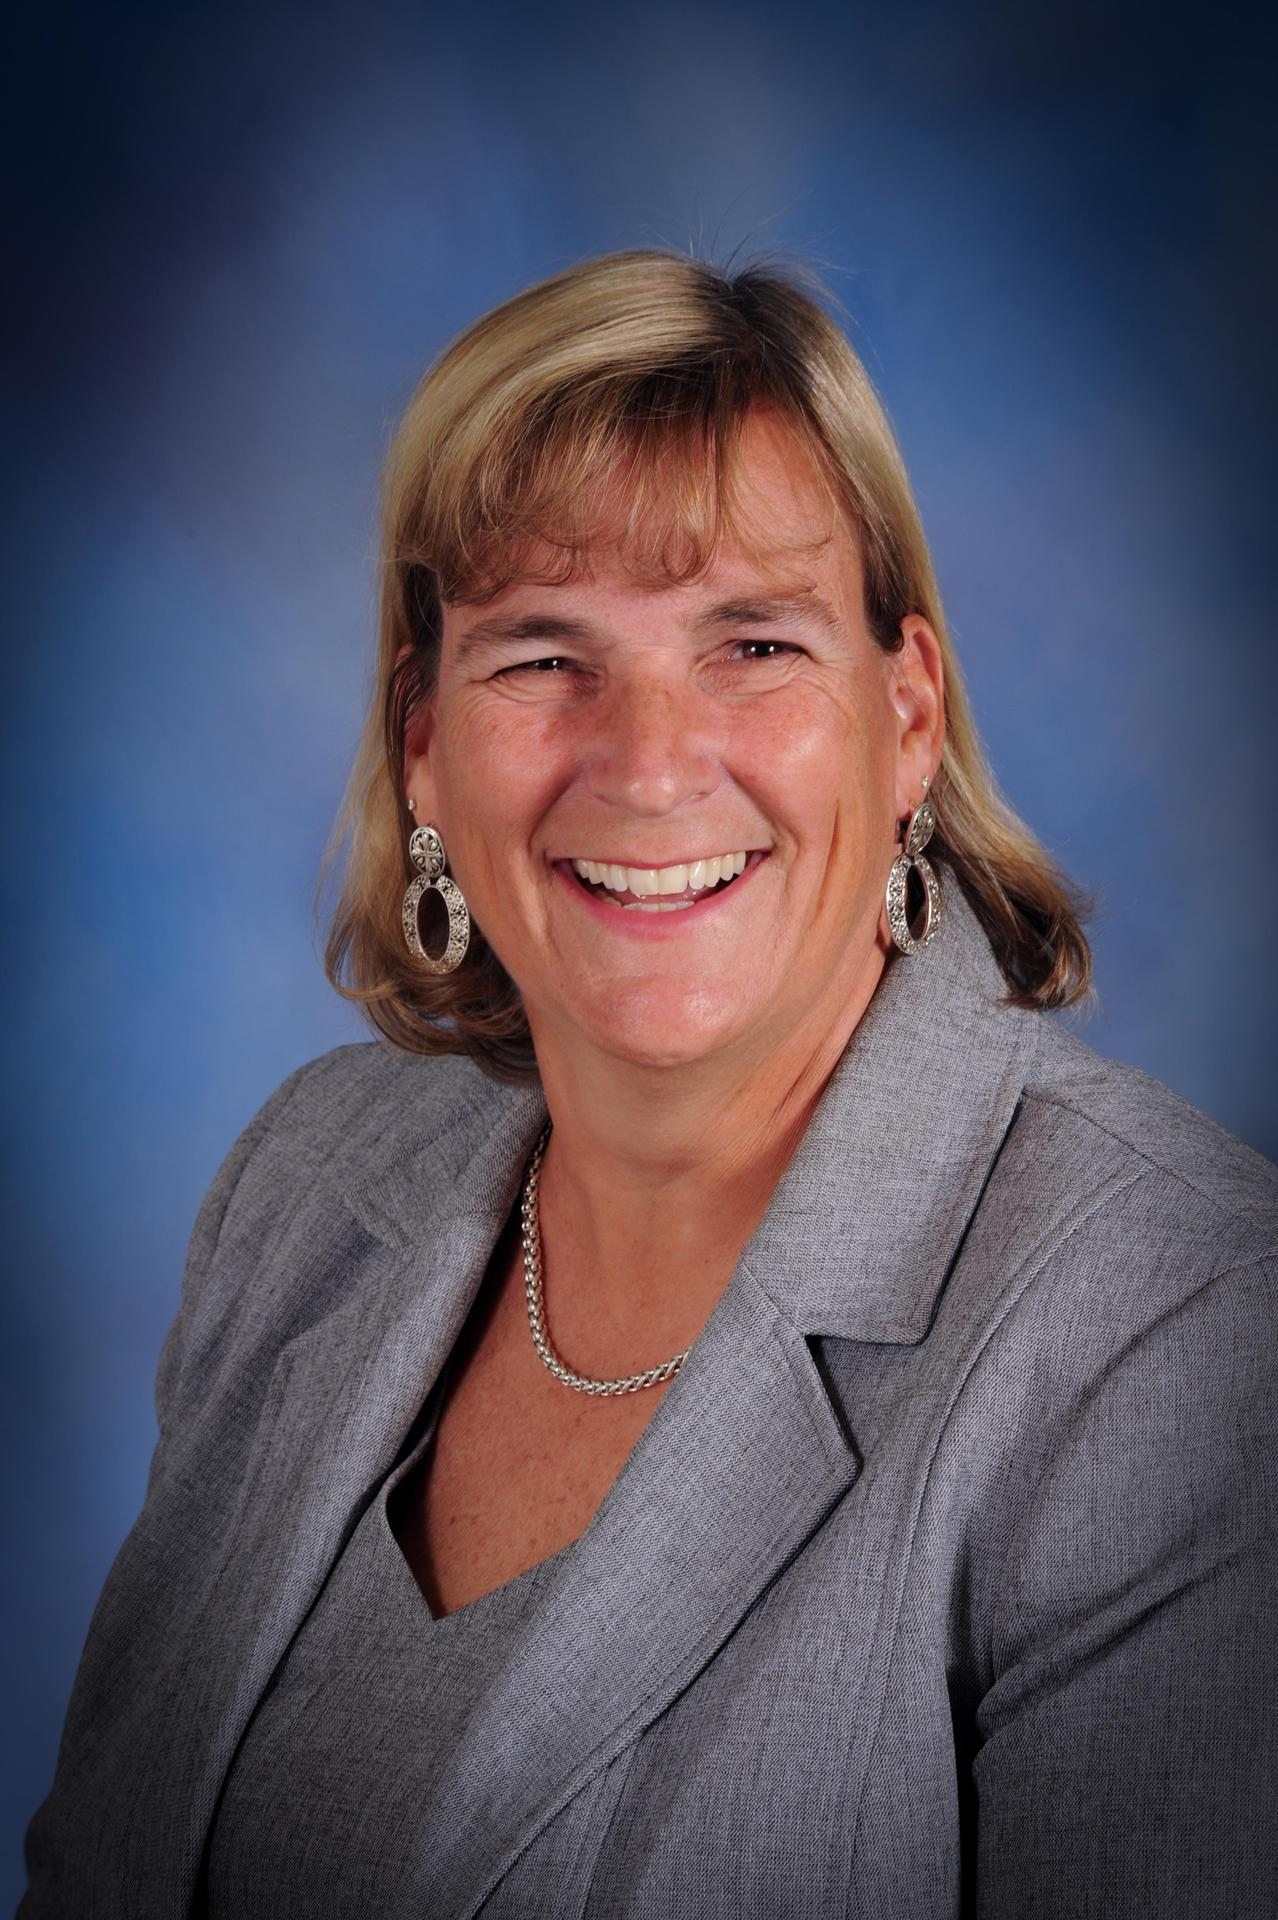 Julie Byers